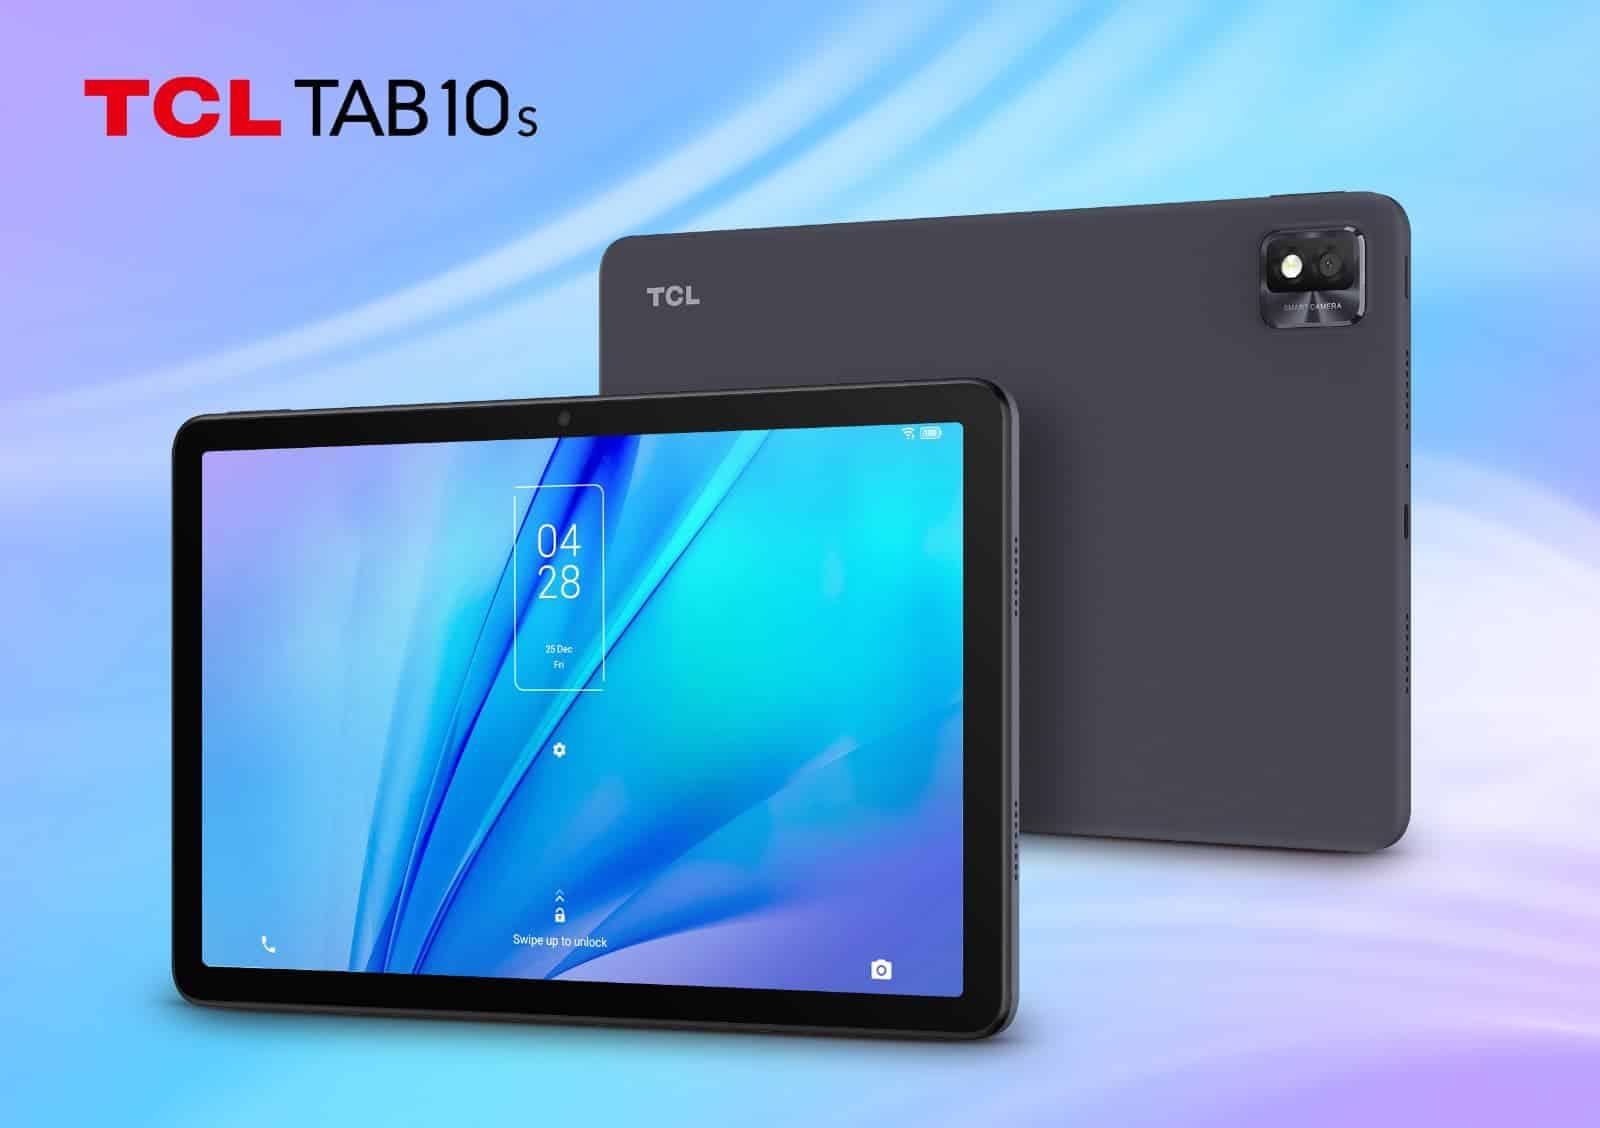 03 TCL NXTPAPER Tablets CES 2021 presserTCL TAB 10S V2 02